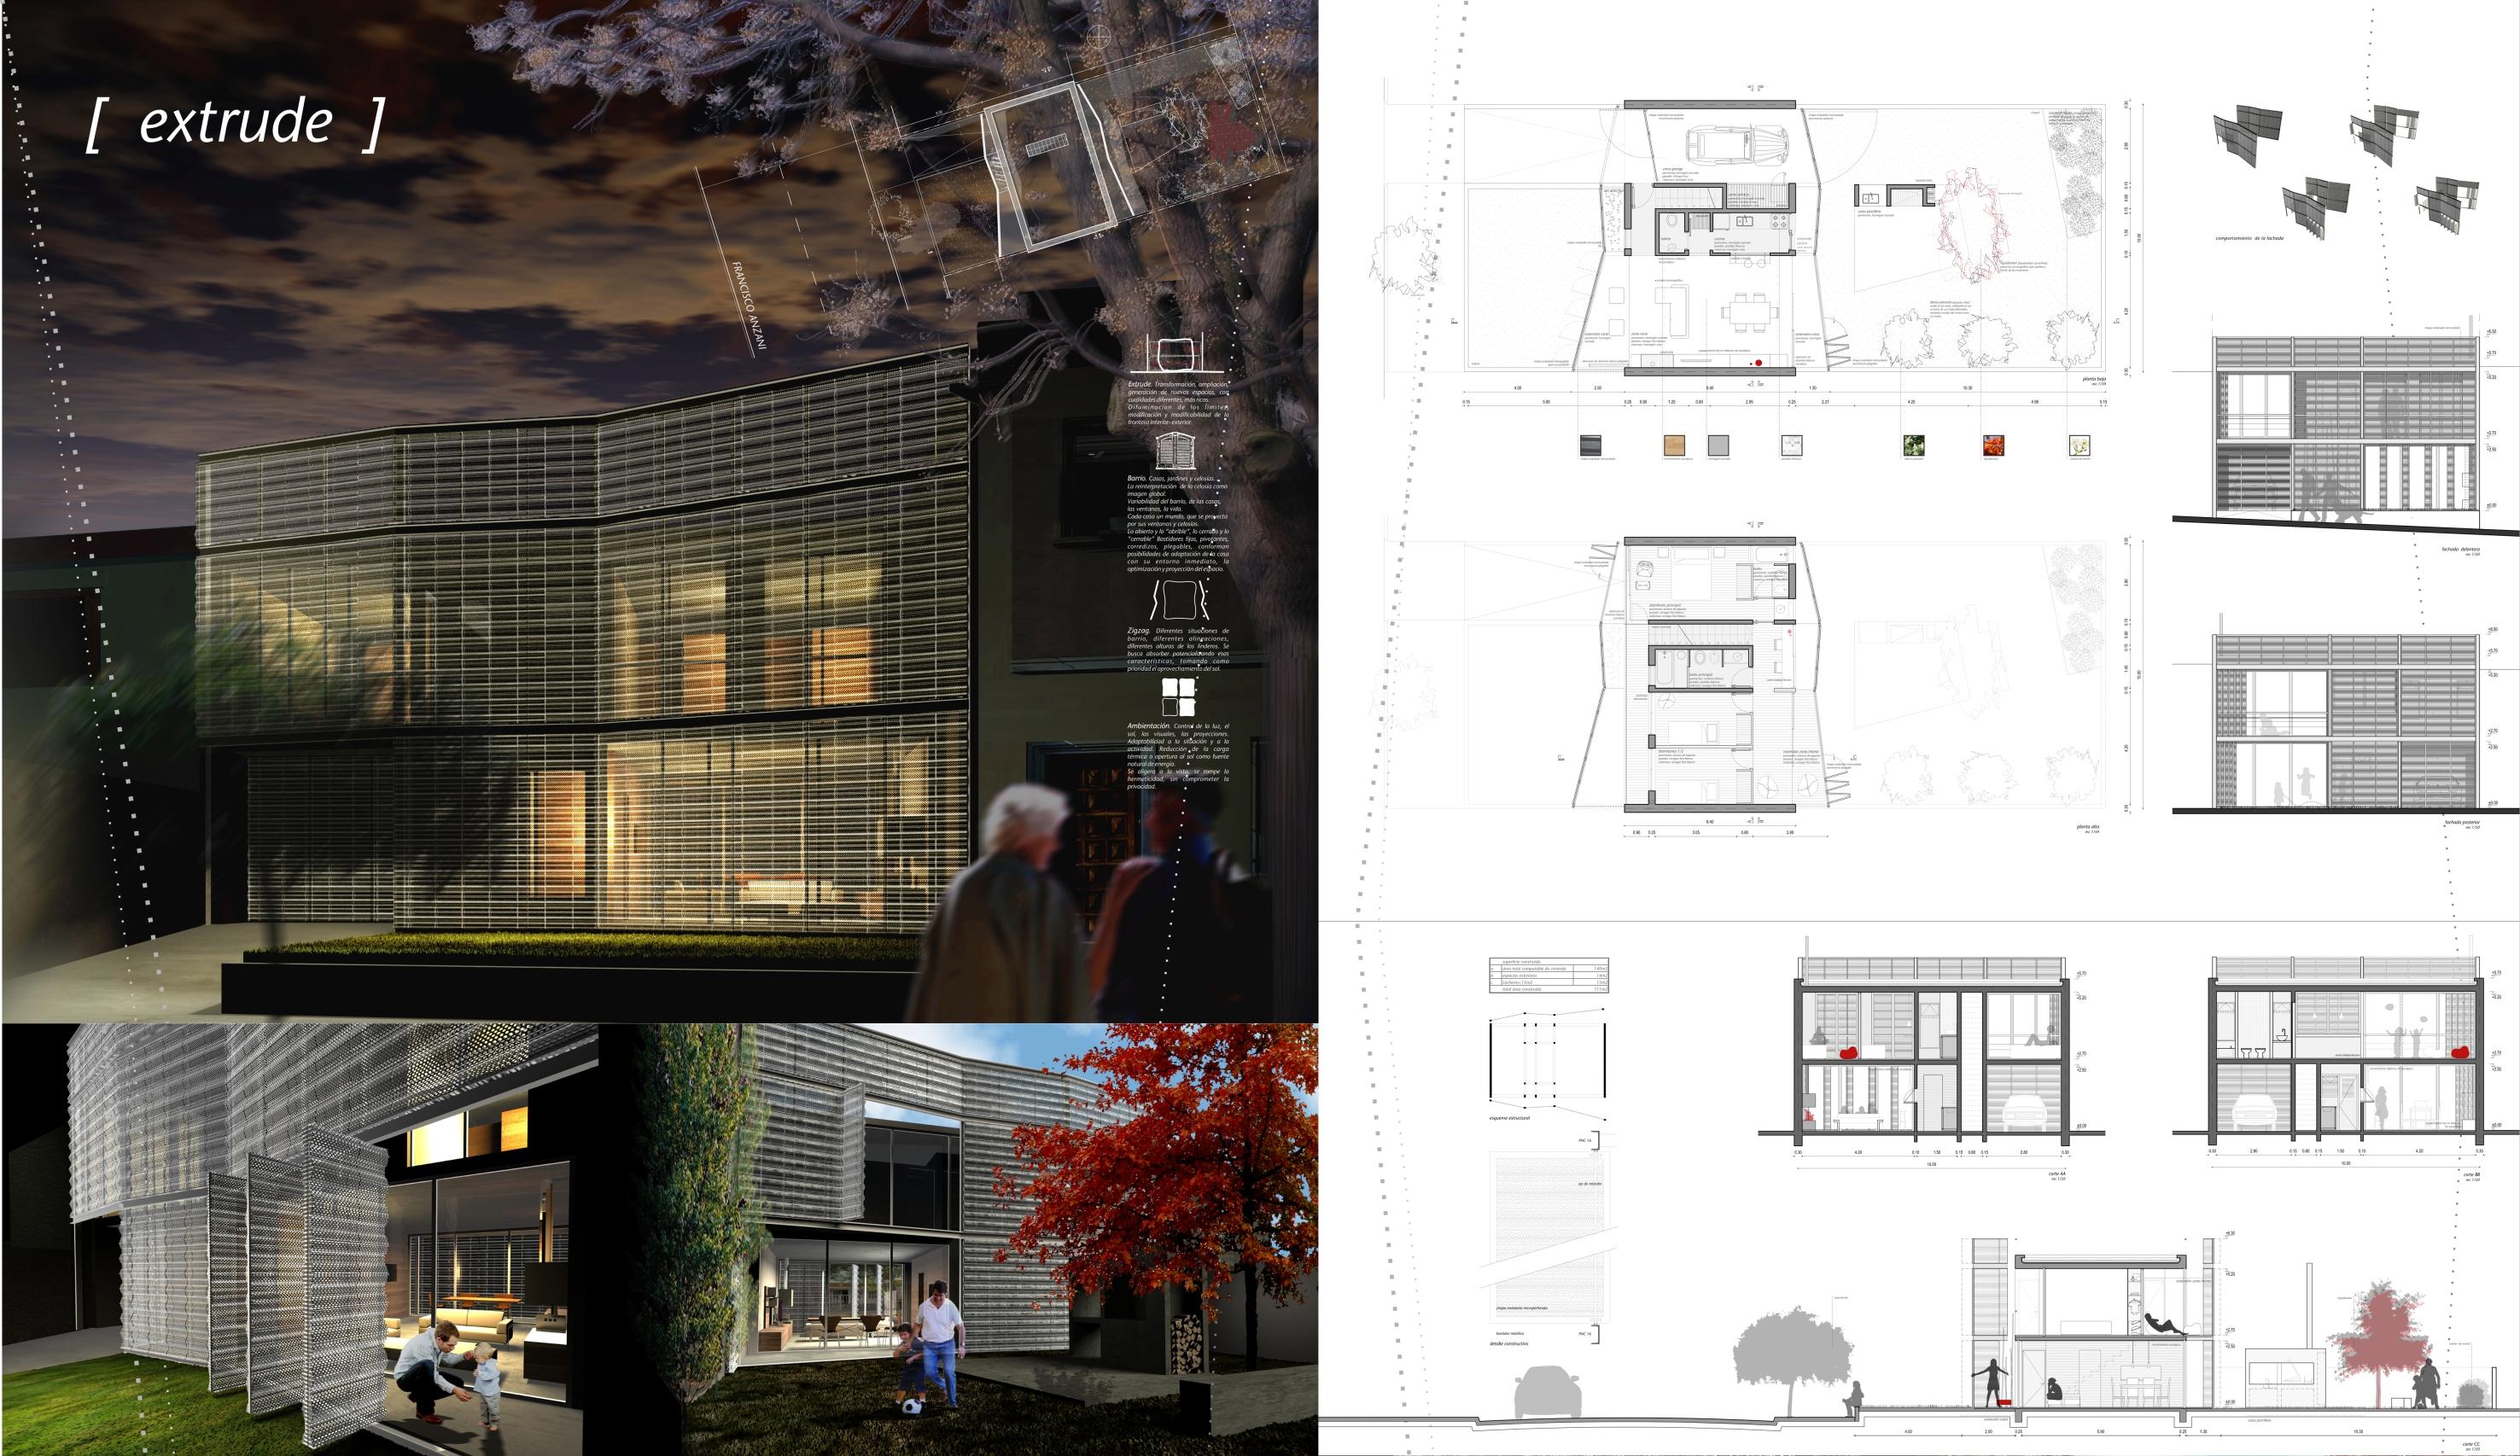 Extrude house